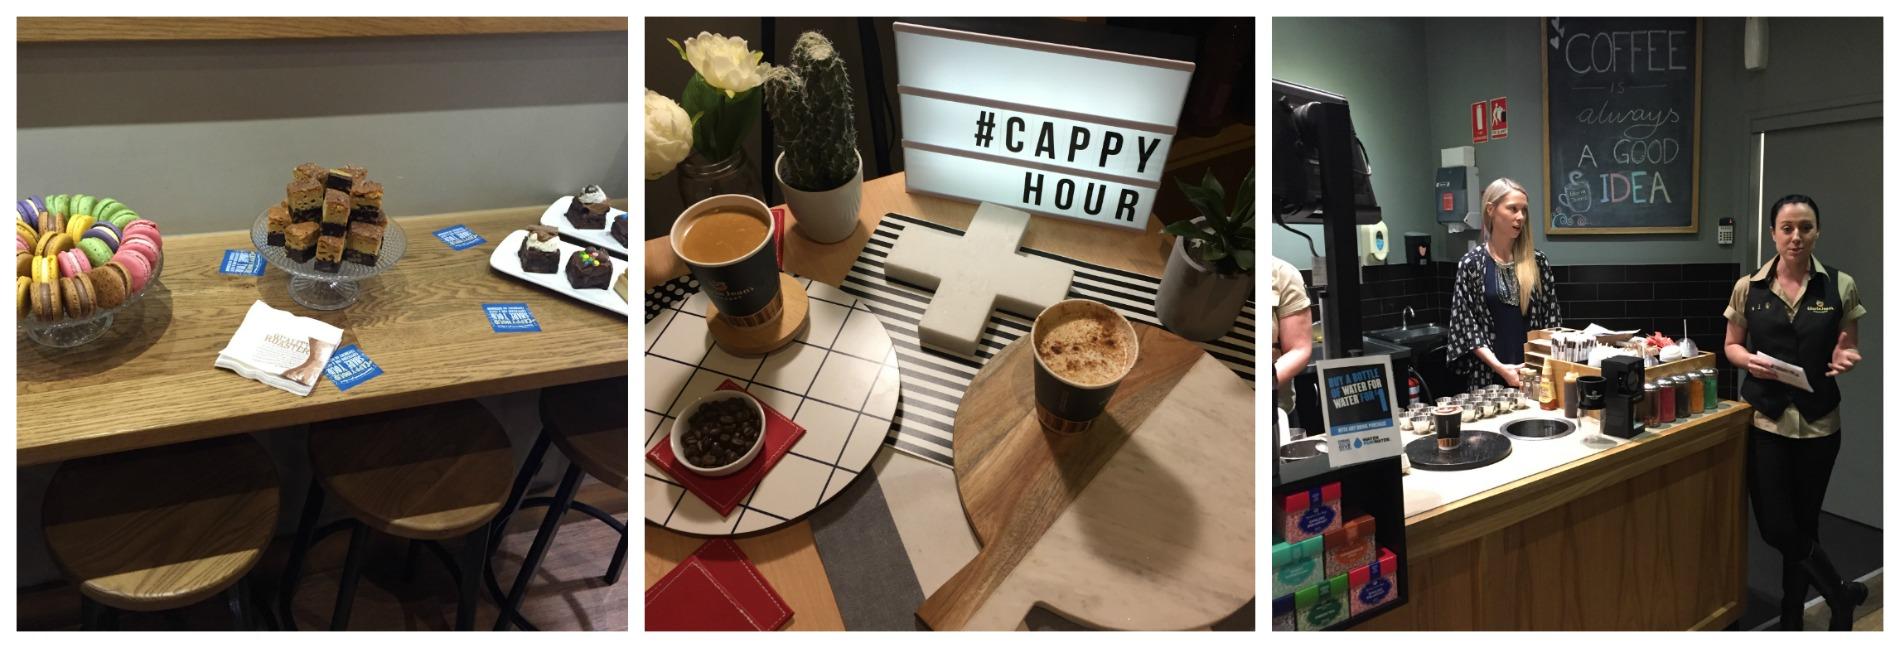 my last minute coffee date